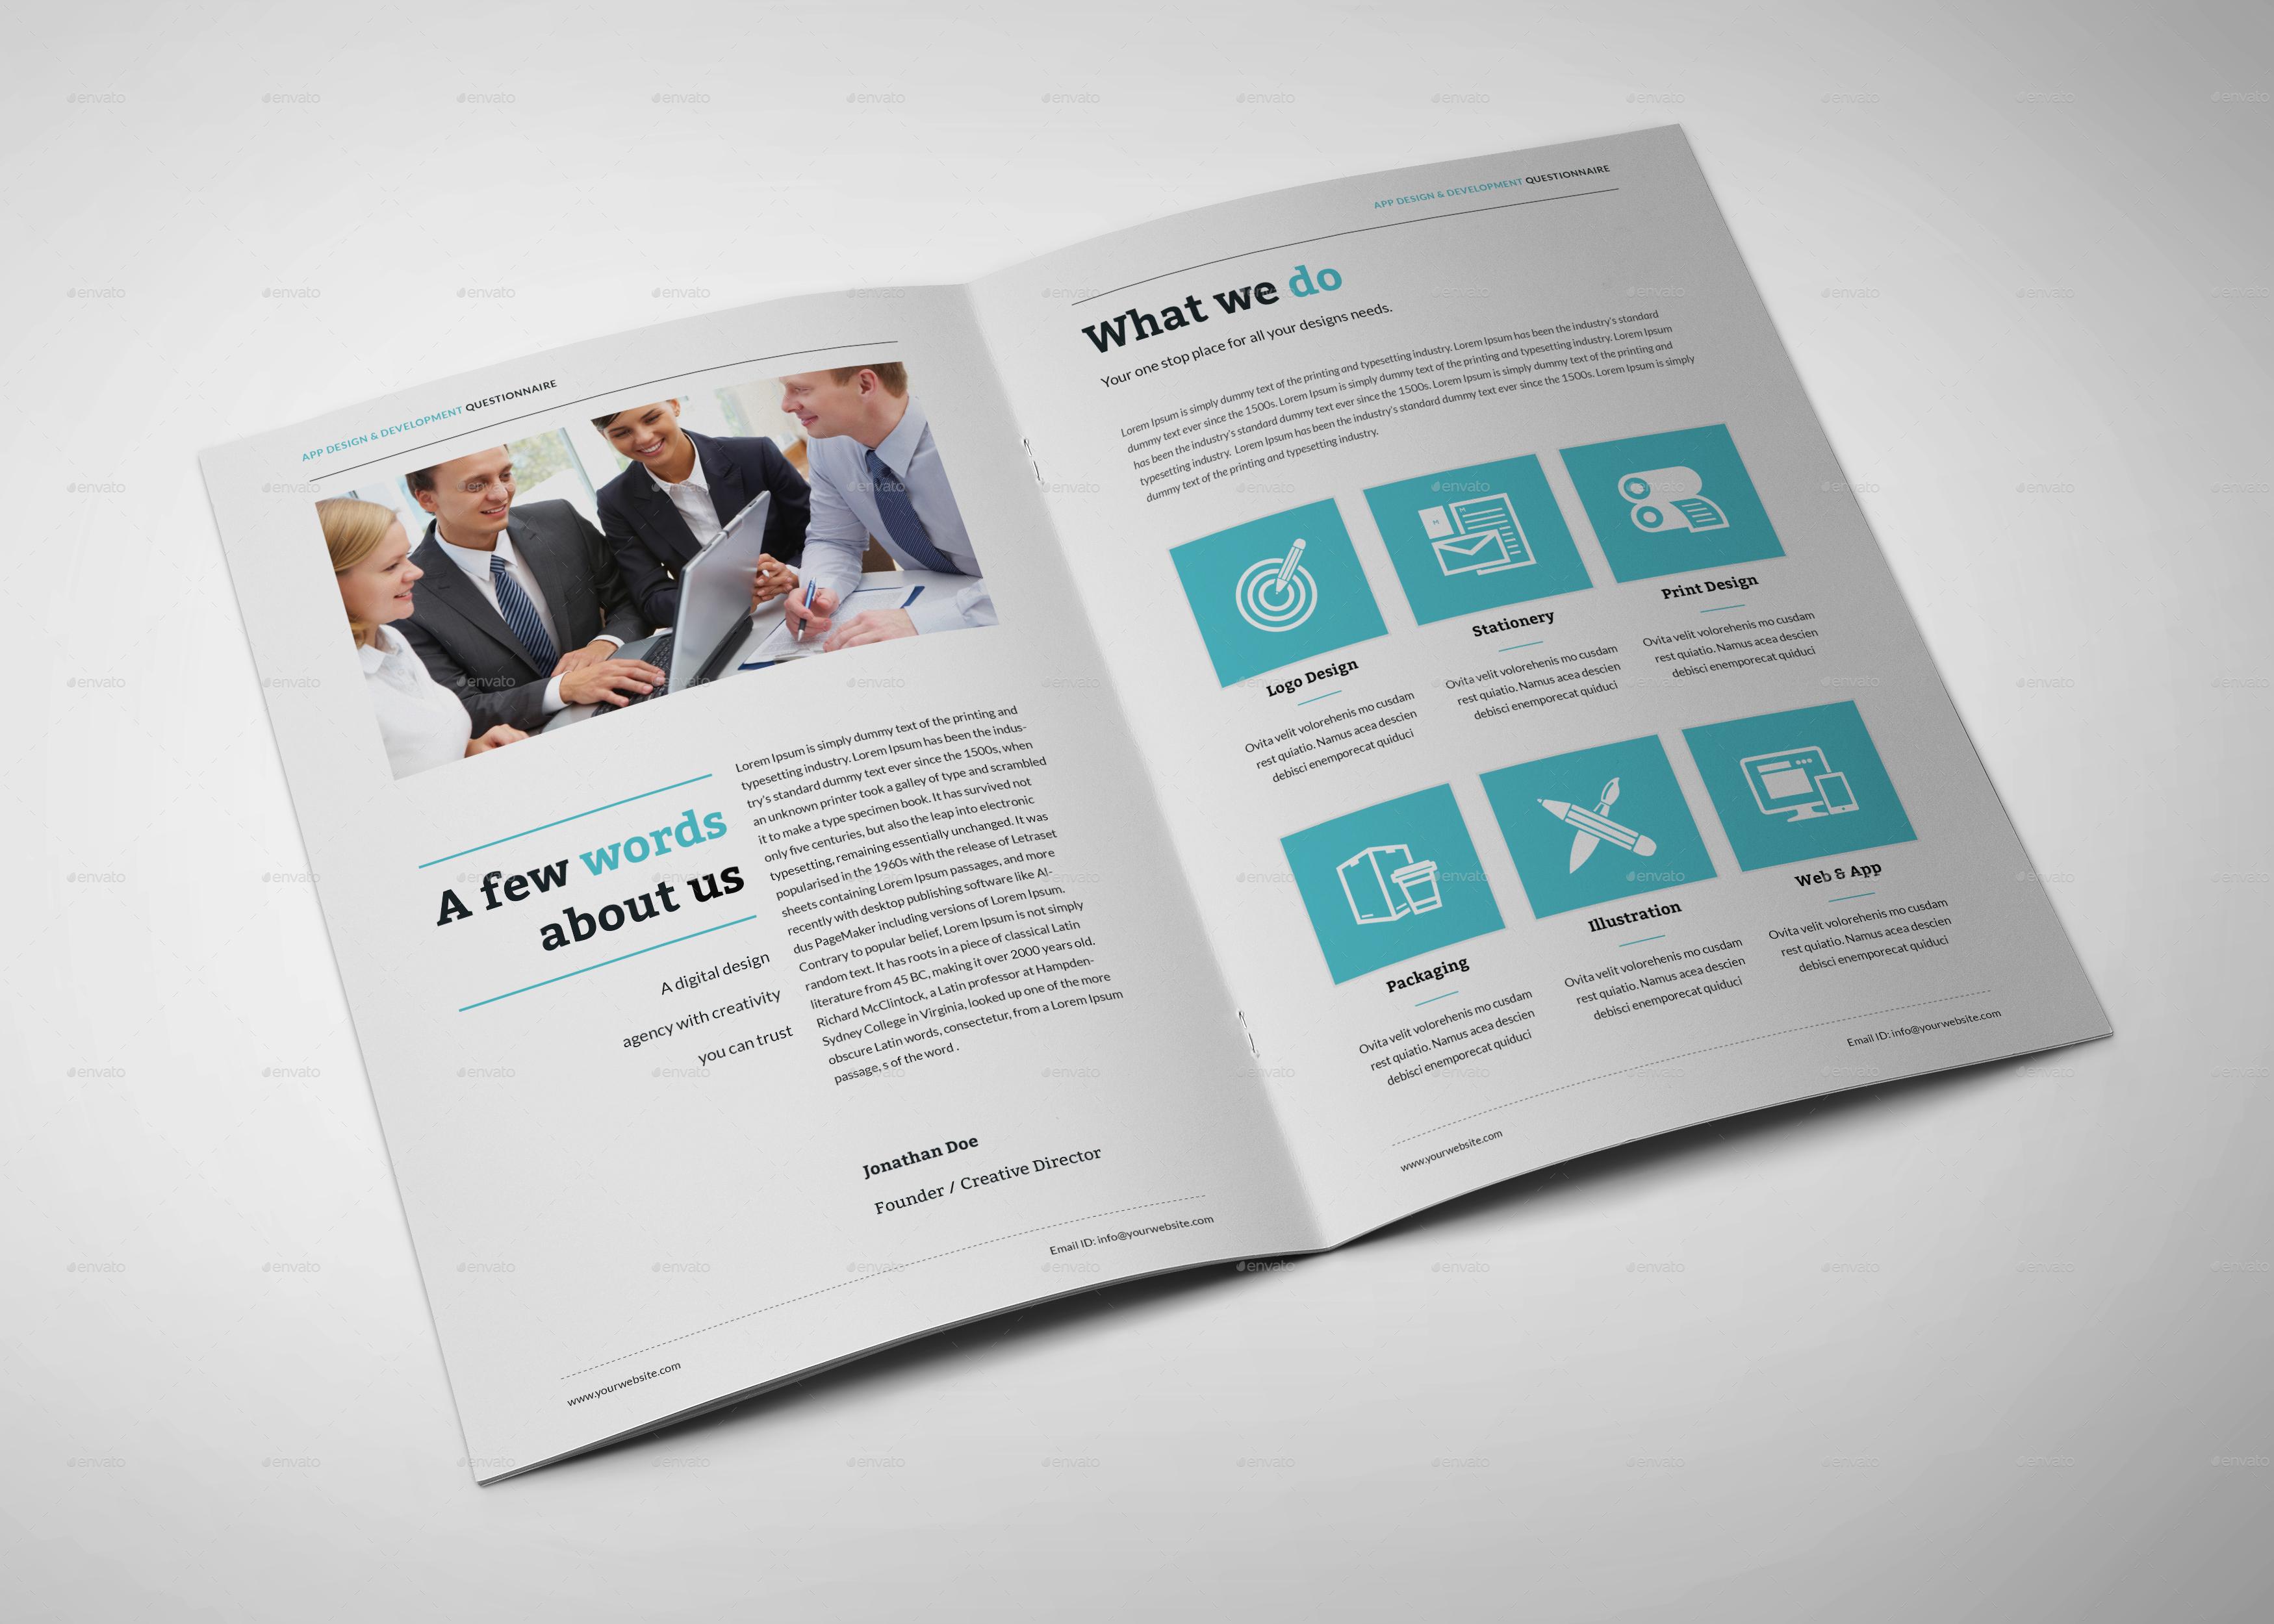 T-shirt design questionnaire - Preview App Design Questionnaire 1 Jpg Preview App Design Questionnaire 11 Jpg